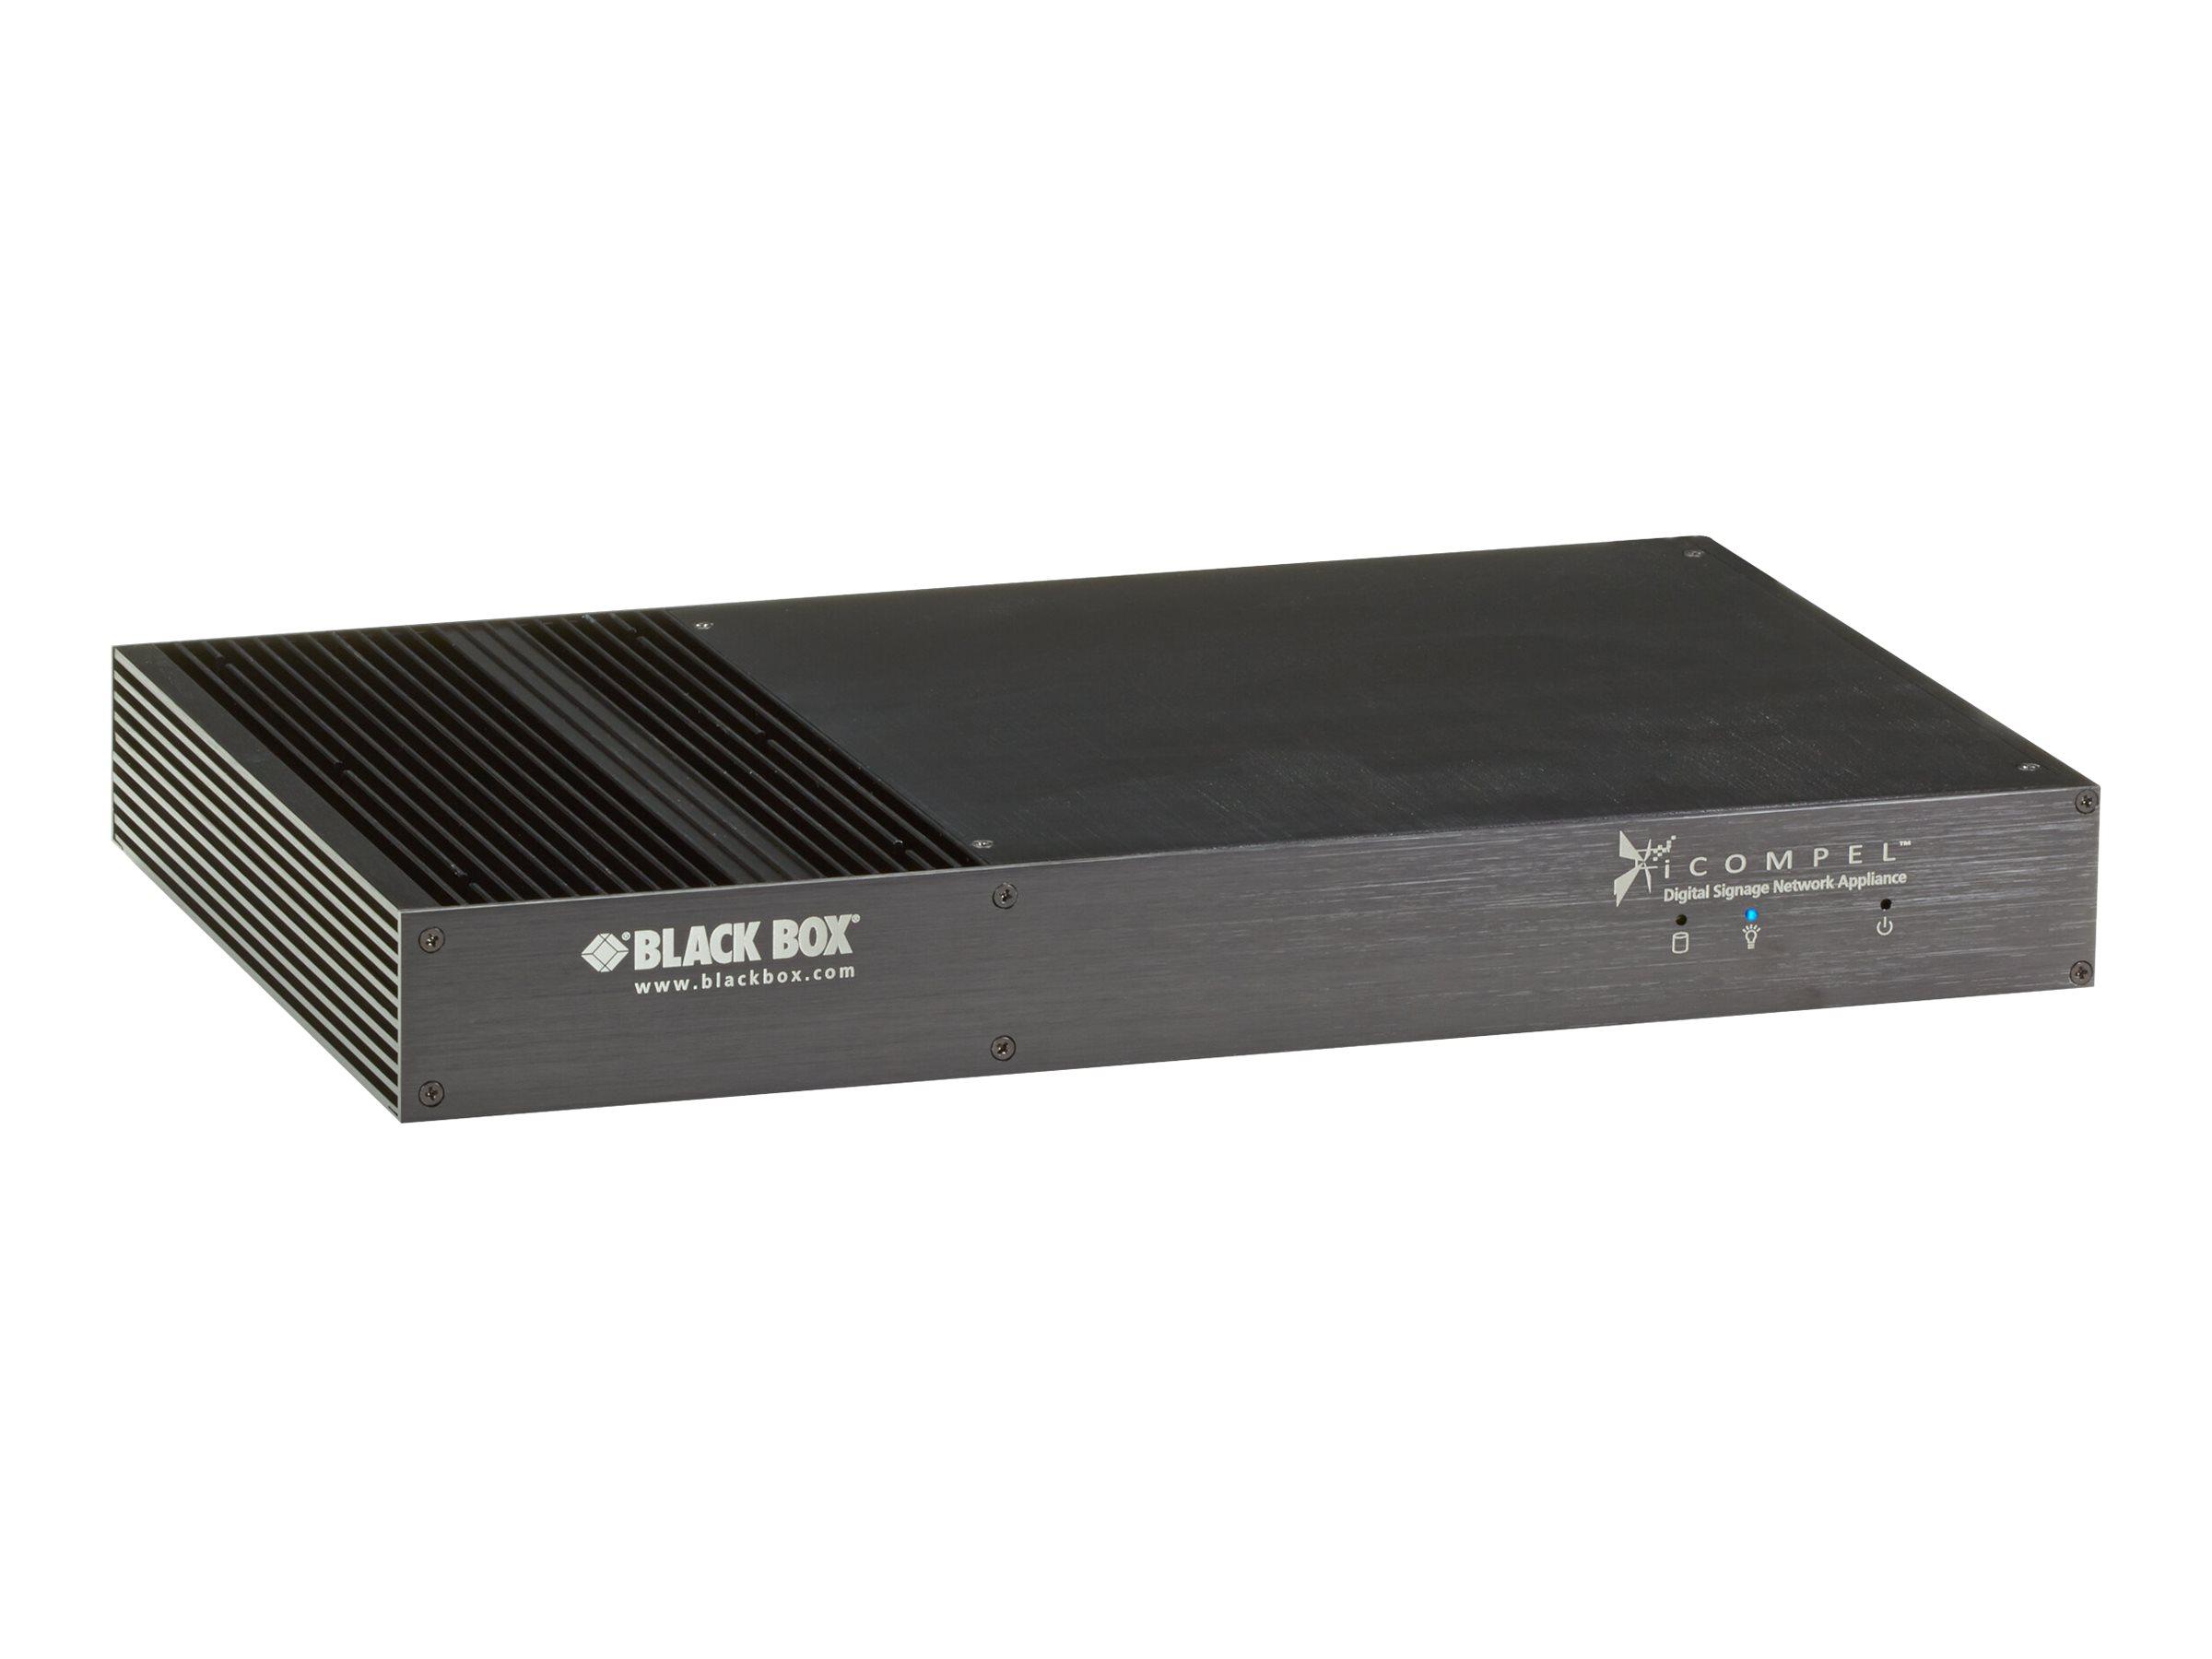 Black Box iCOMPEL Q Series VESA Subscriber - Publisher für Digital Signage - Intel Celeron - RAM 4 GB - 60 GB - Linux